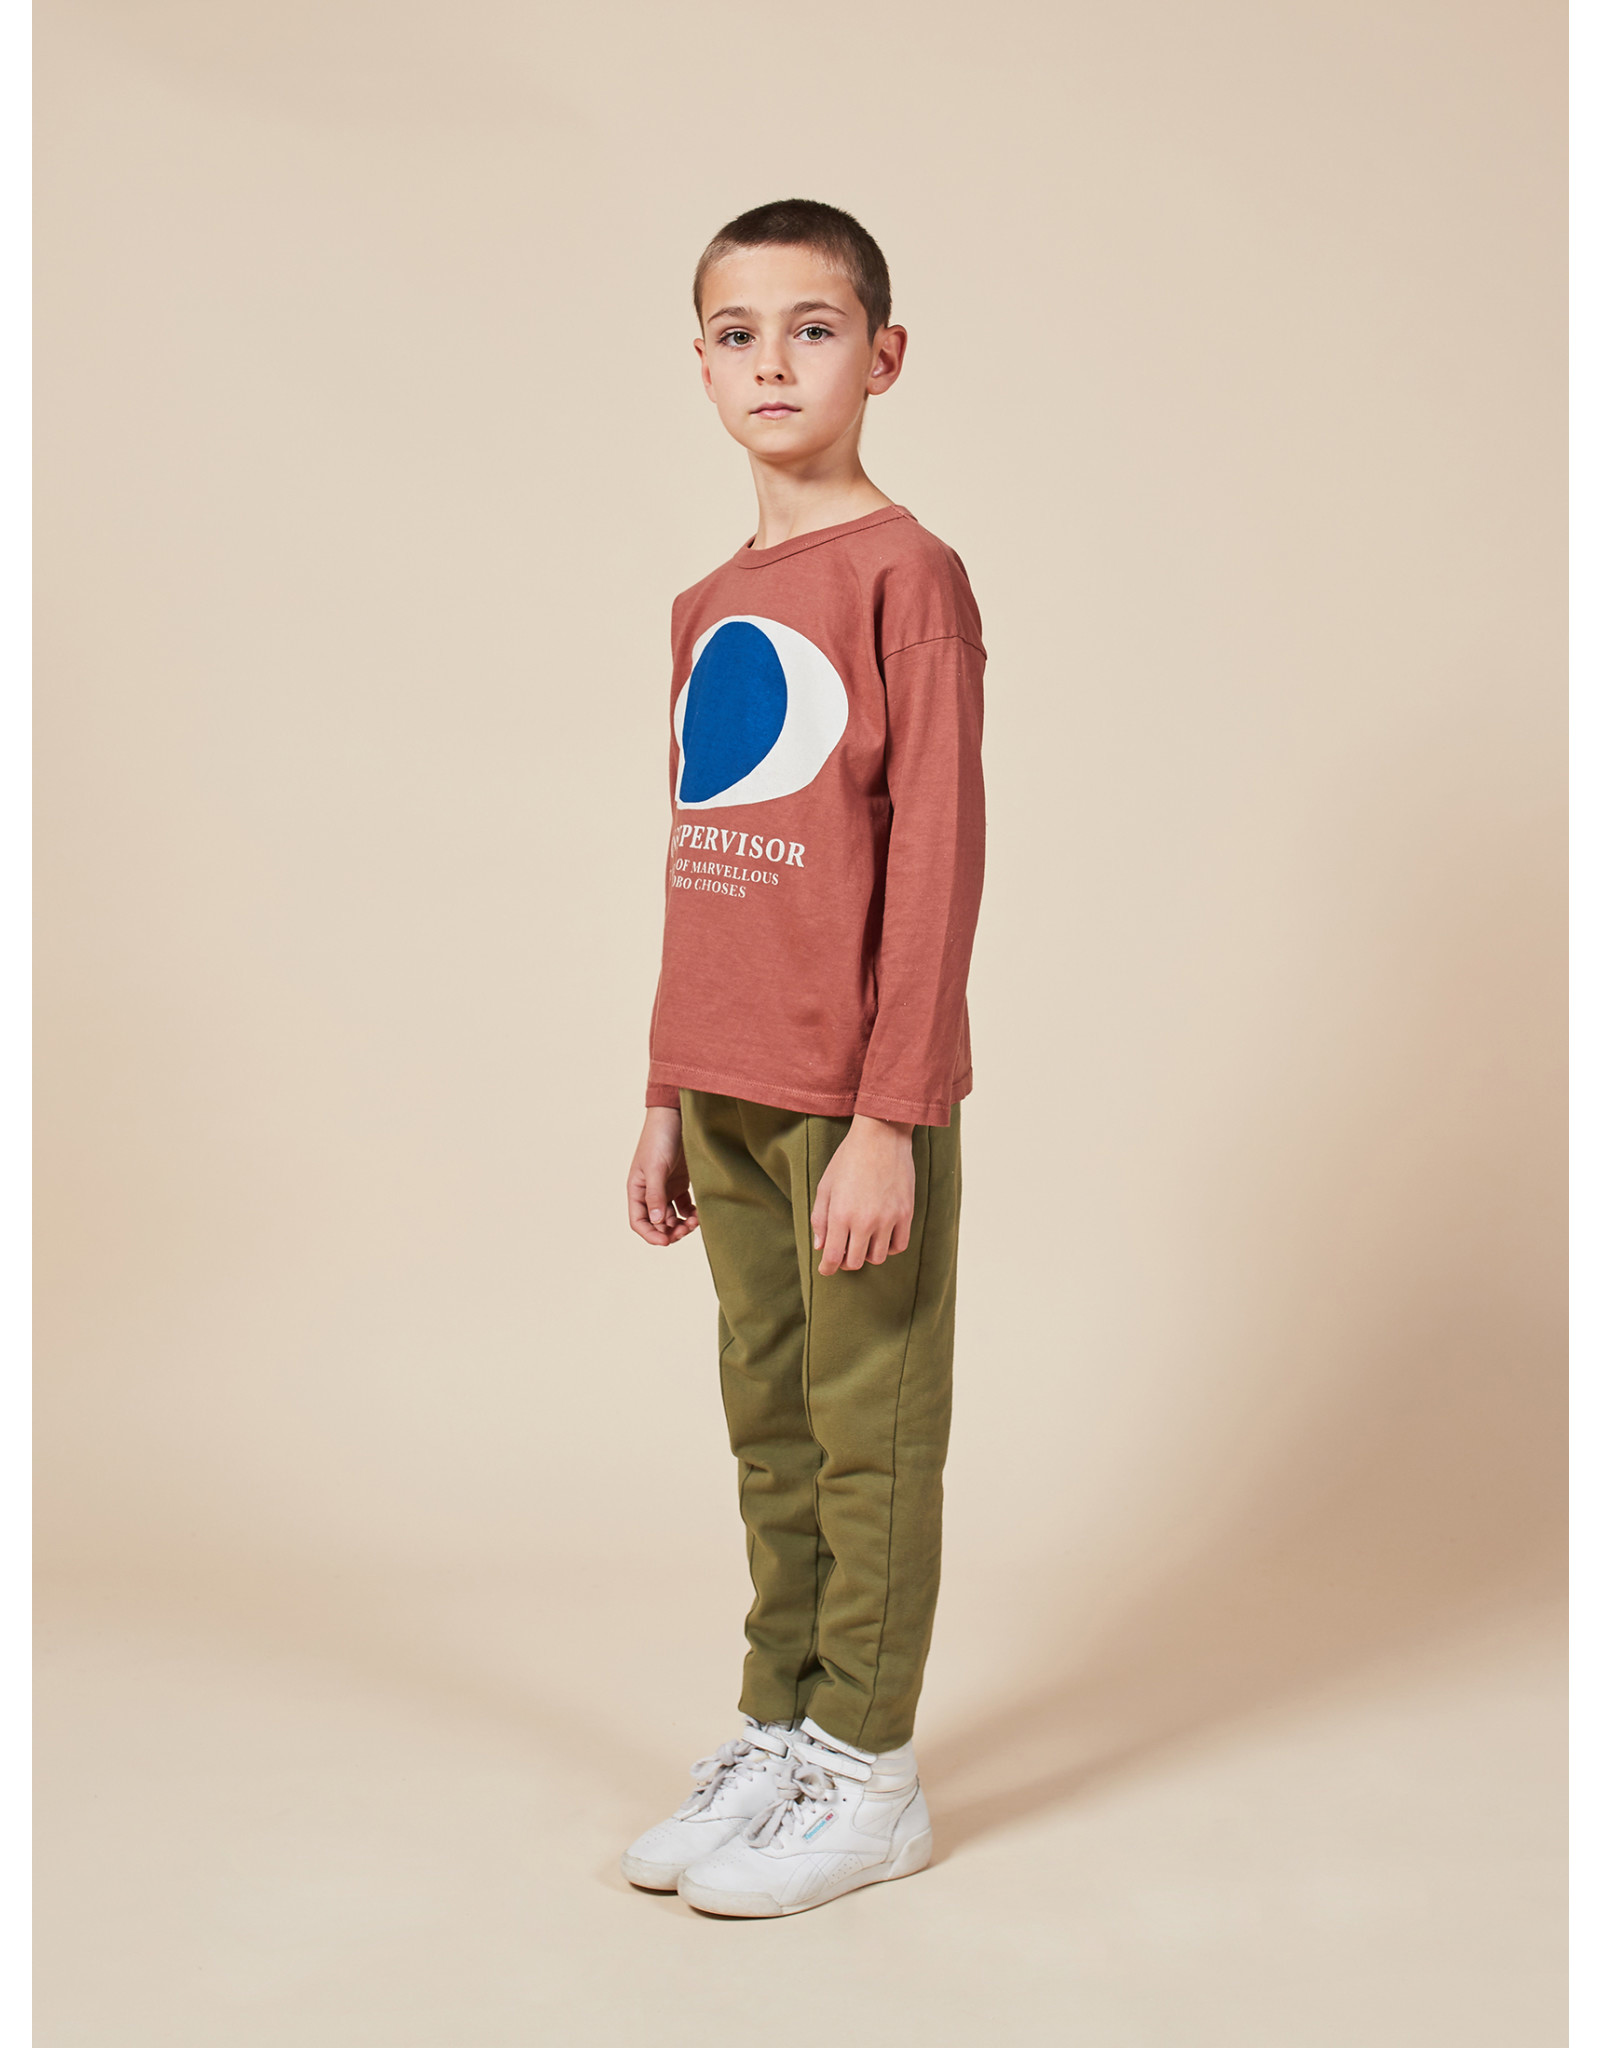 Bobo Choses Multicolor stripes embroidery pants